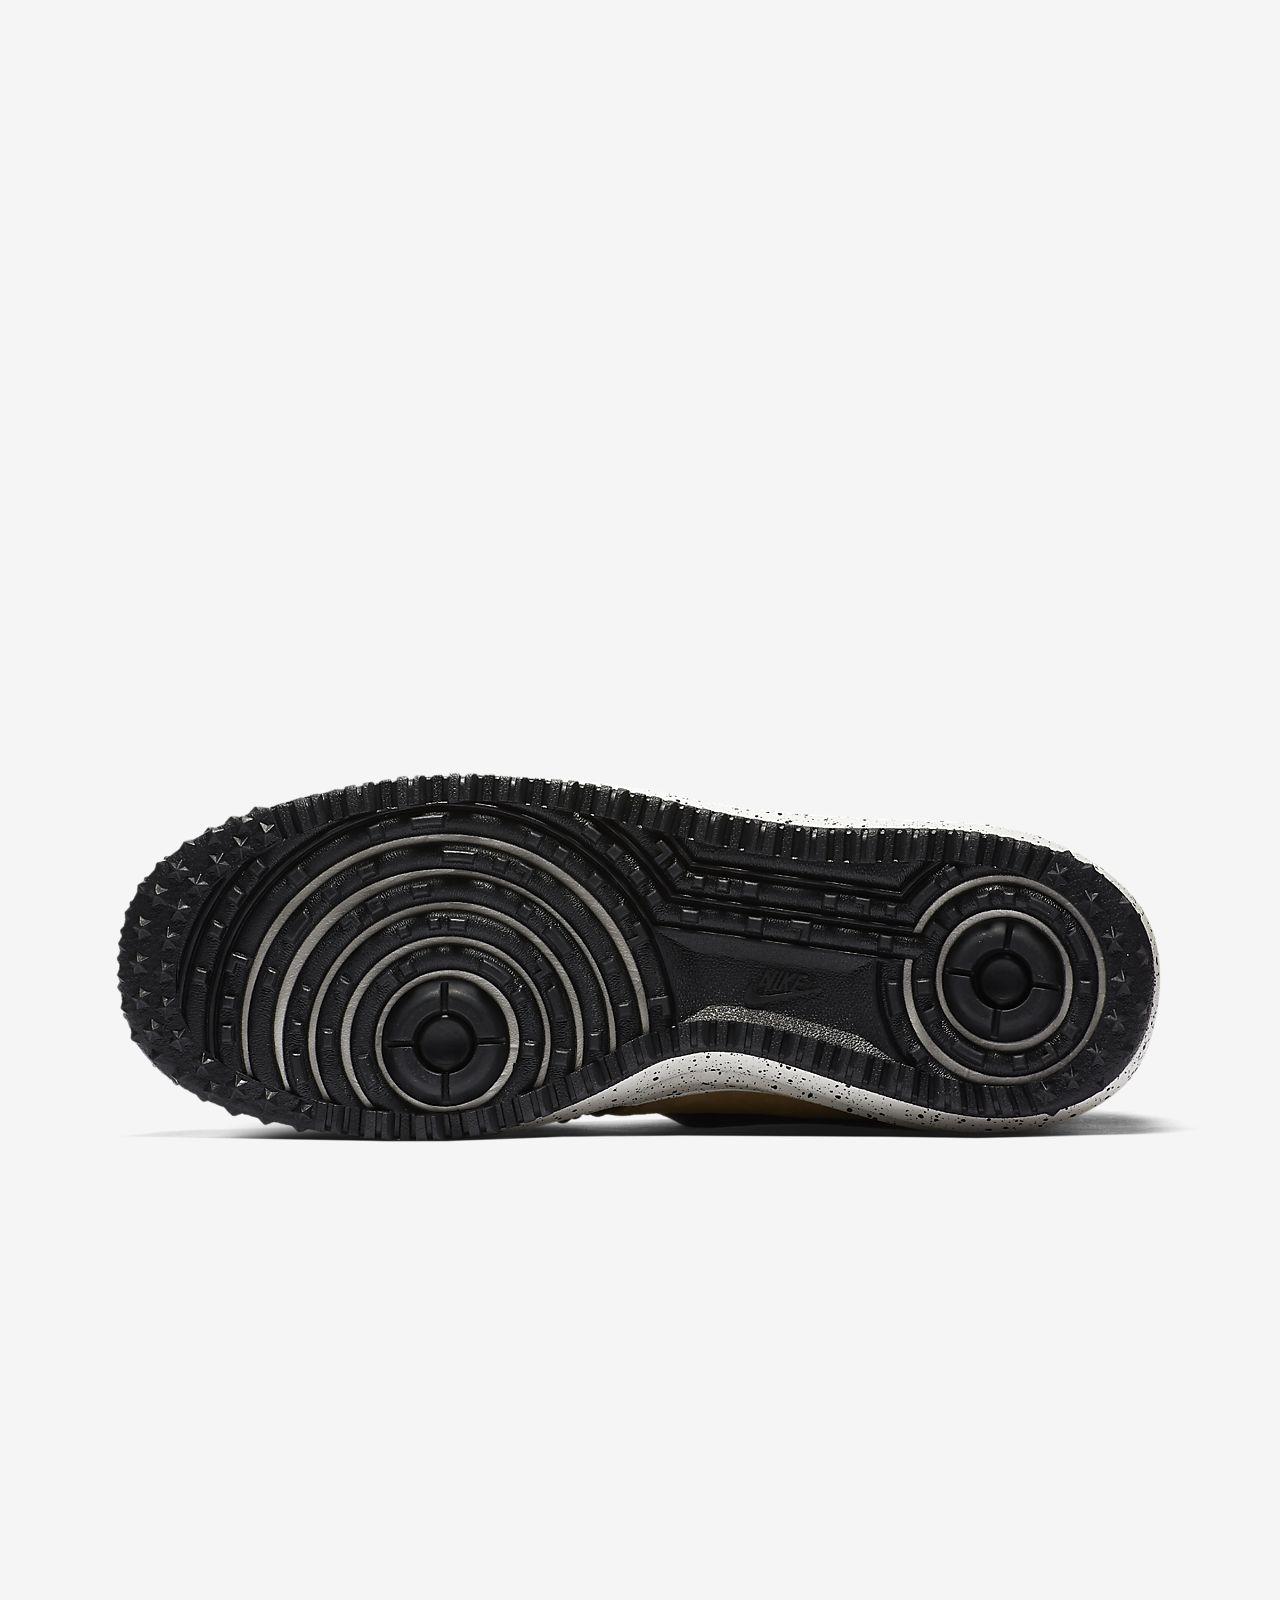 ... Botte Nike Lunar Force 1 Duckboot '17 pour Homme